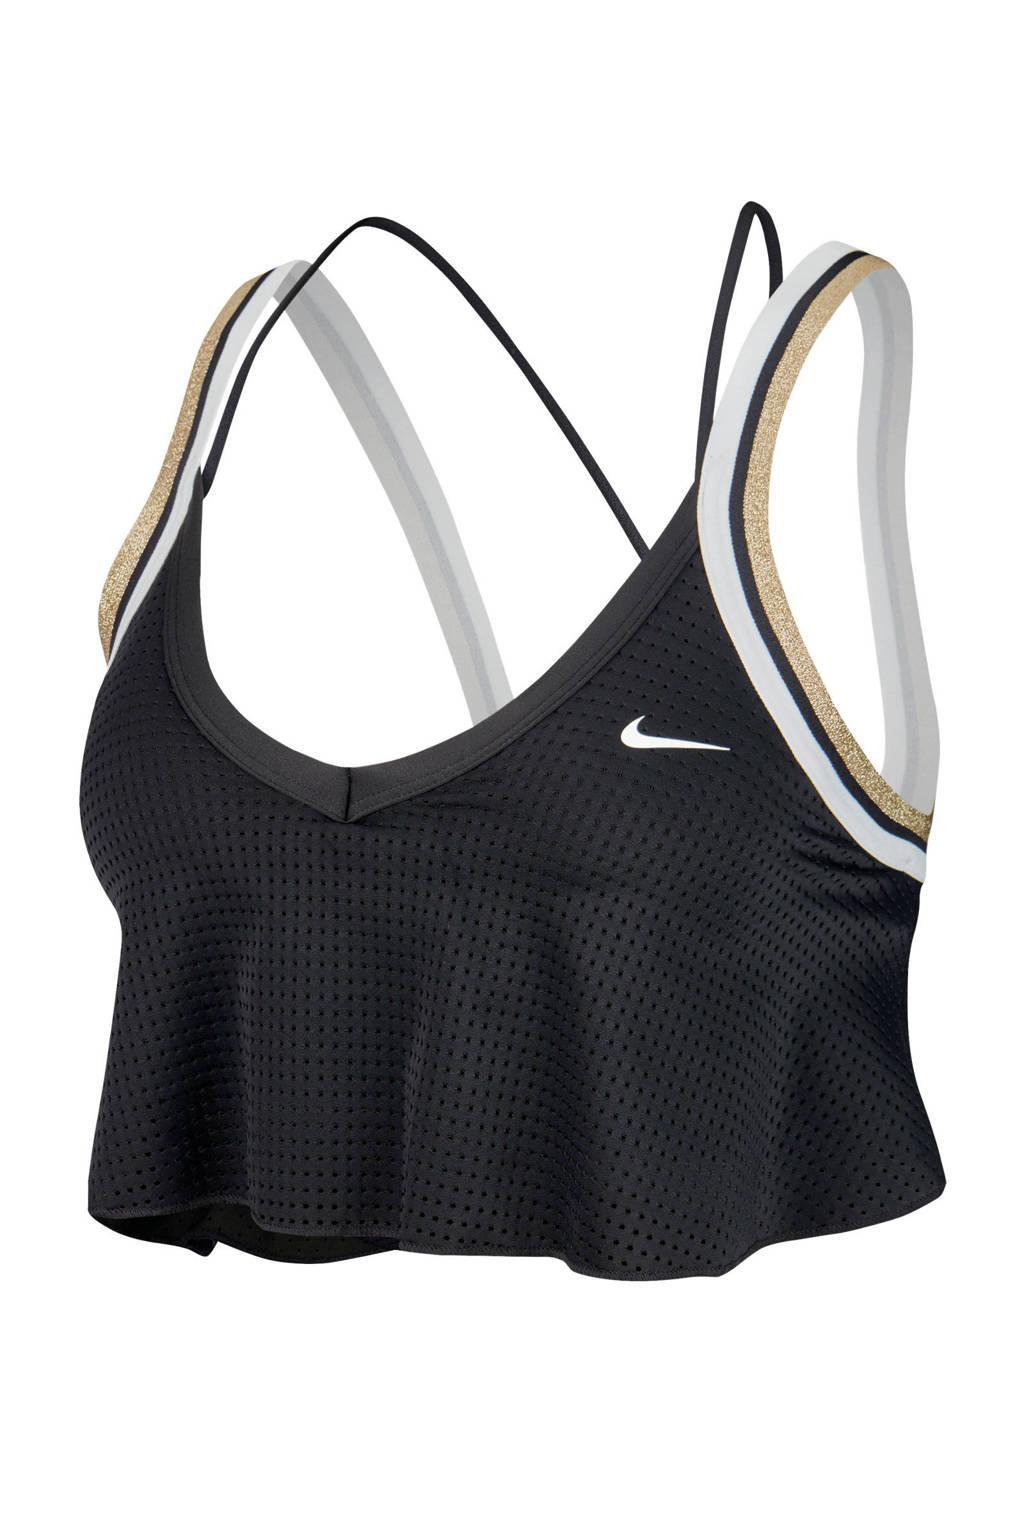 Nike sportbh zwart/wit/goud, Zwart/wit/goud